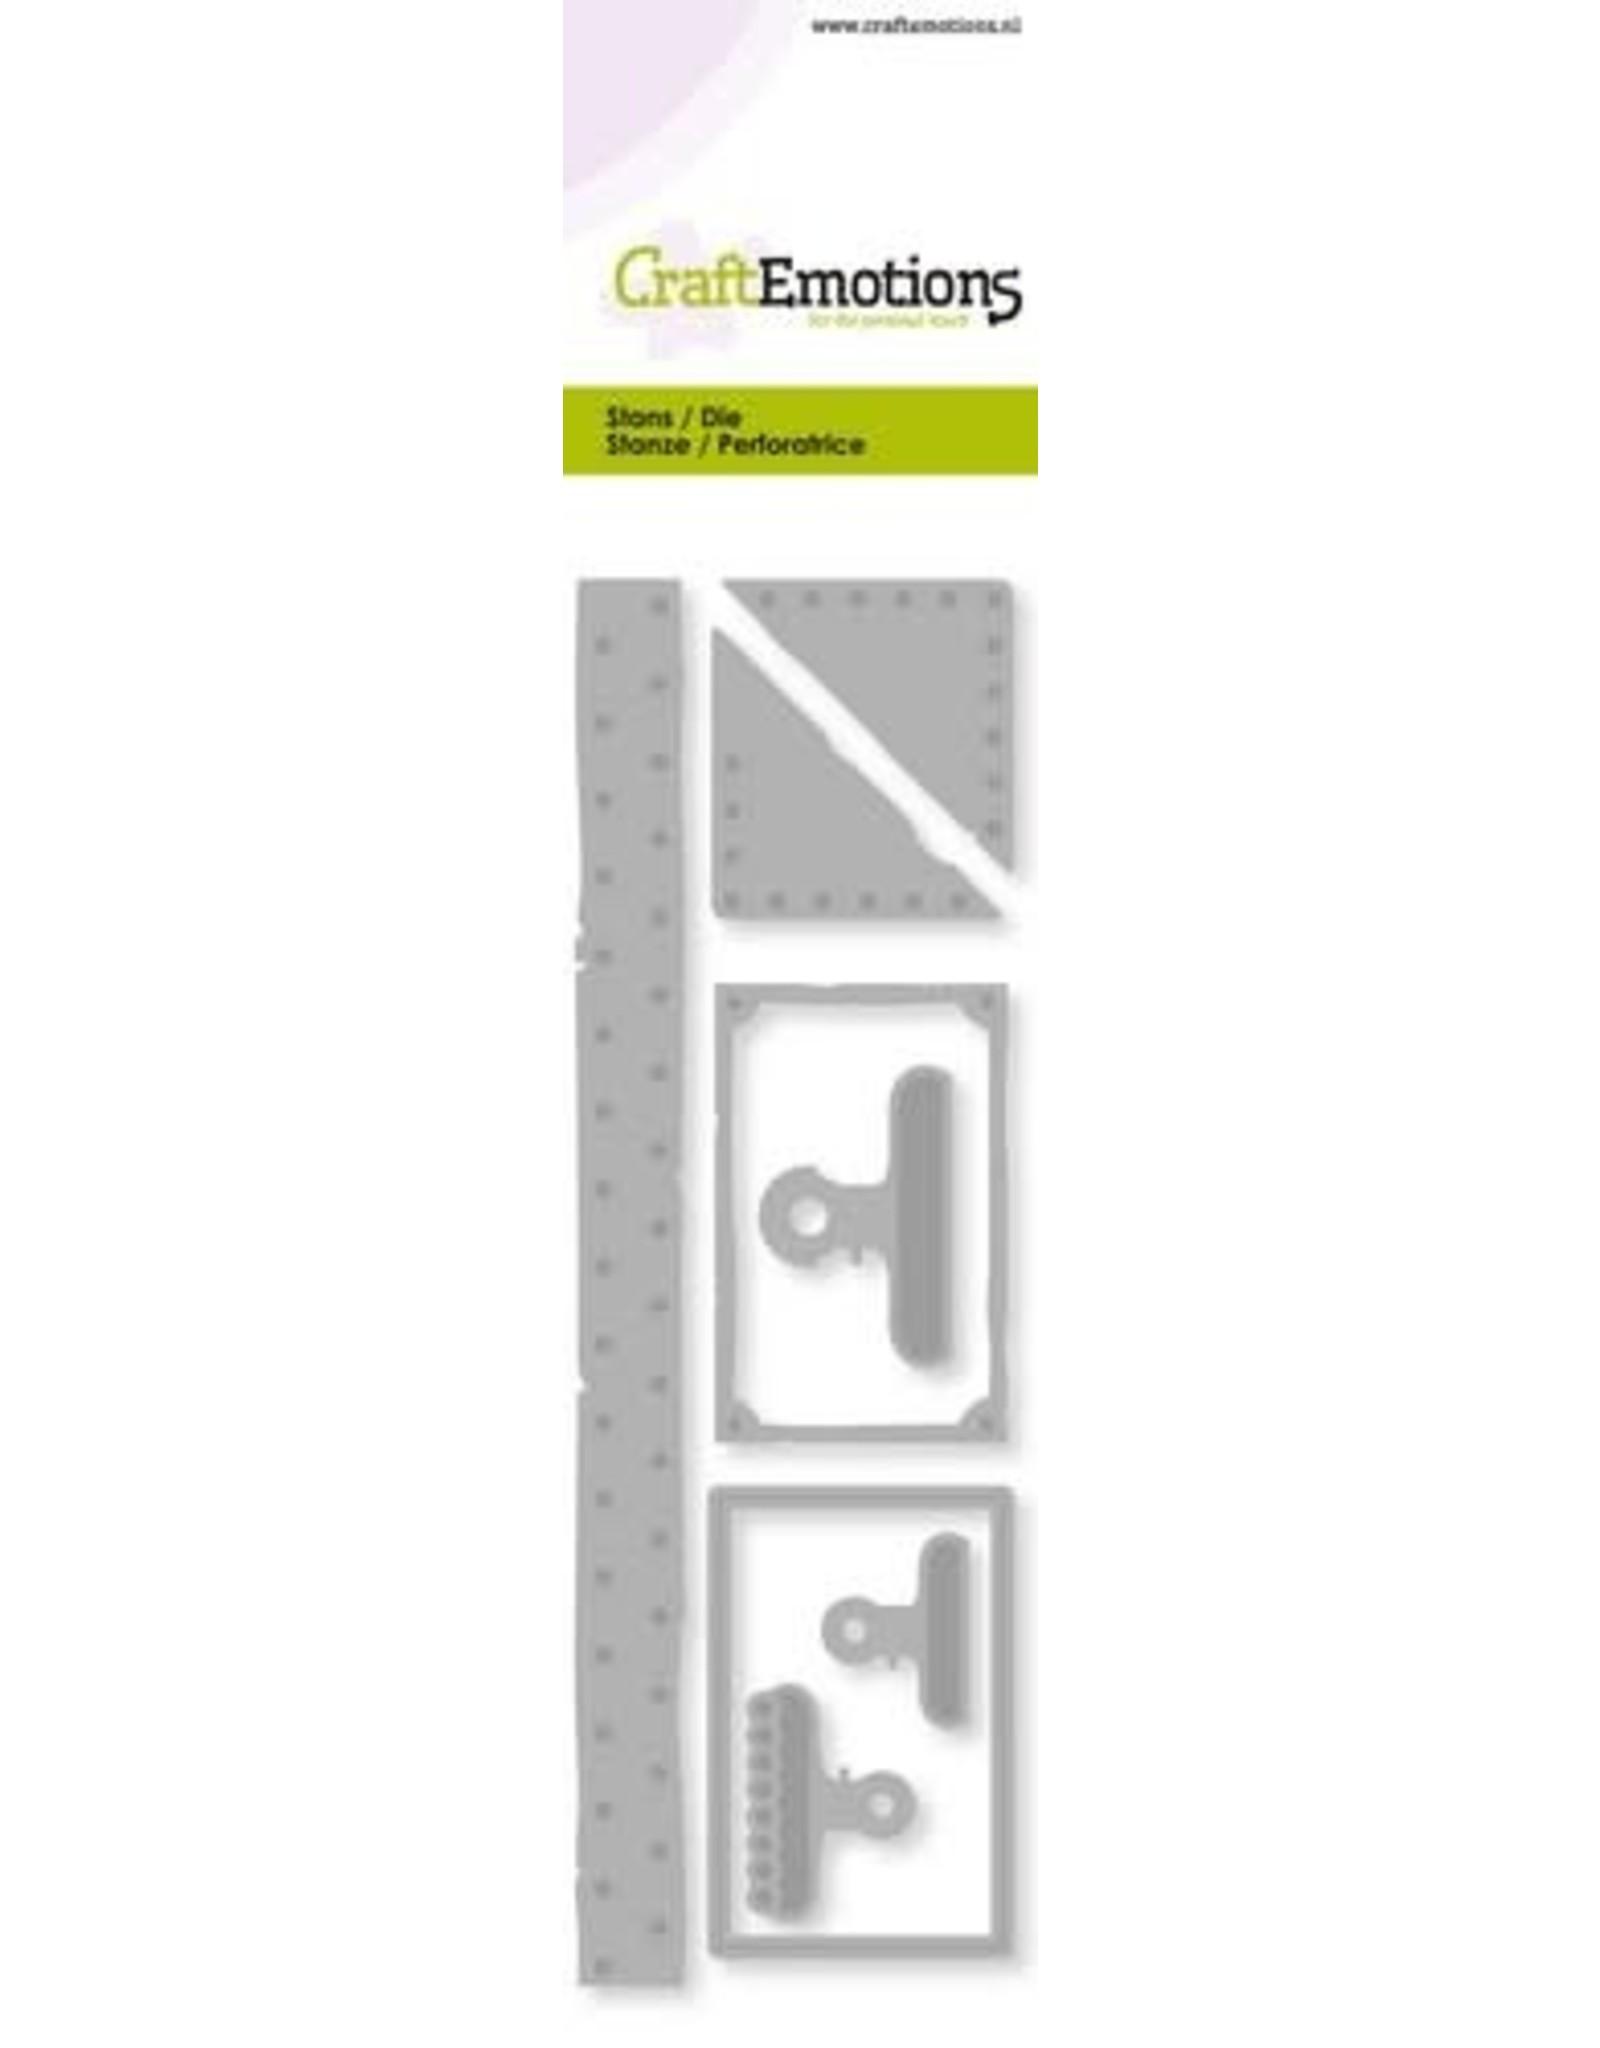 Craft Emotions CraftEmotions Die - vintage label - papierklem - klinknagel Card 5,0x16,0cm